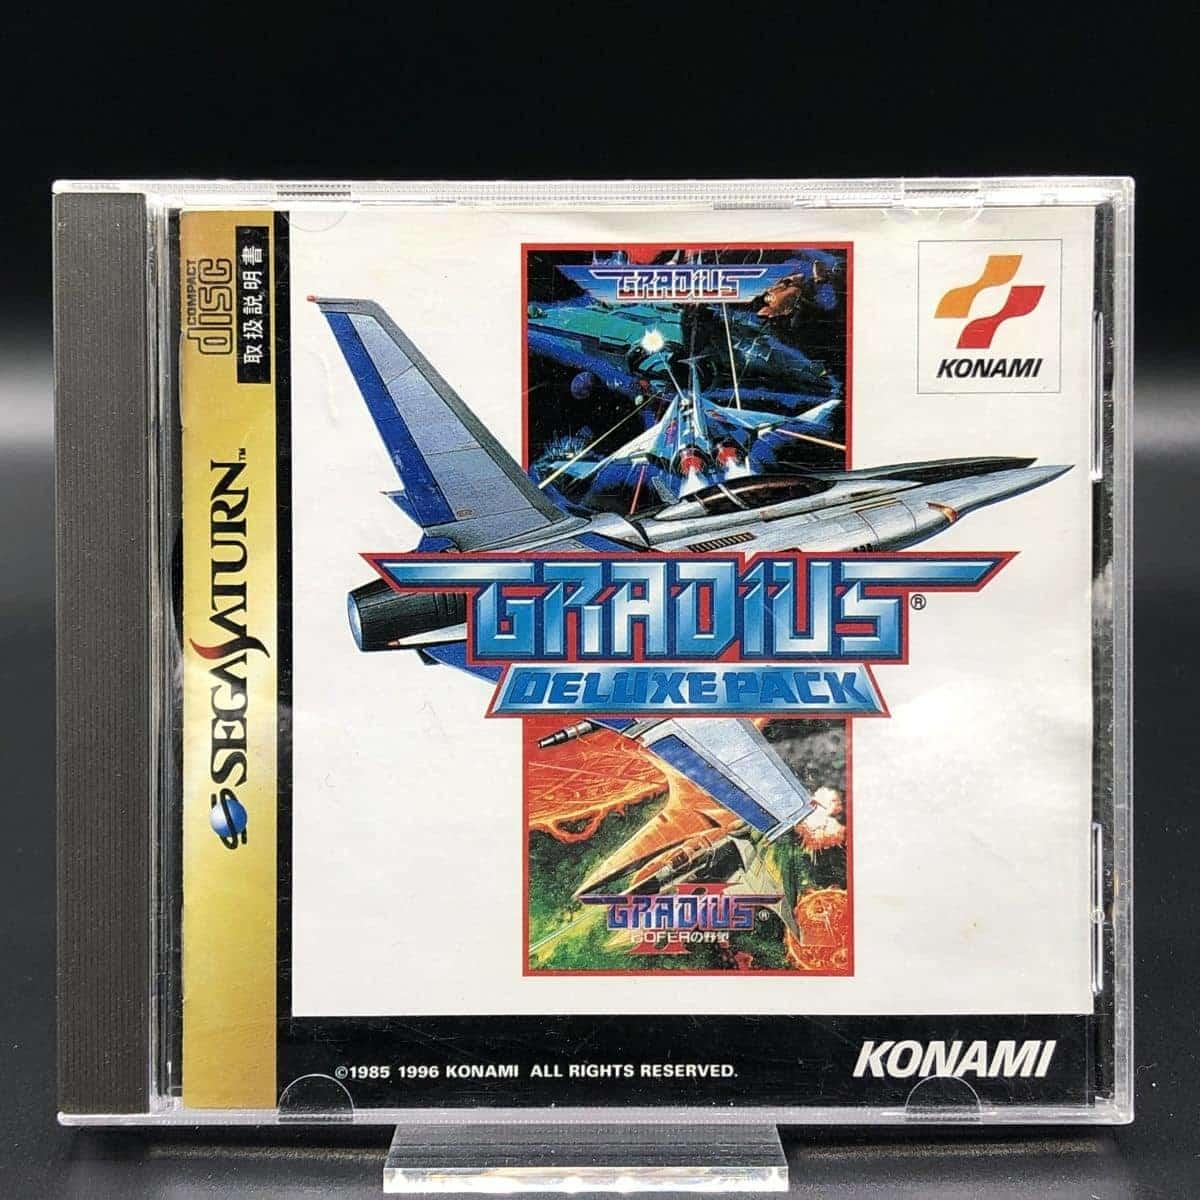 Gradius Deluxe Pack (Import Japan) (Komplett mit Spine) (Sehr gut) Sega Saturn